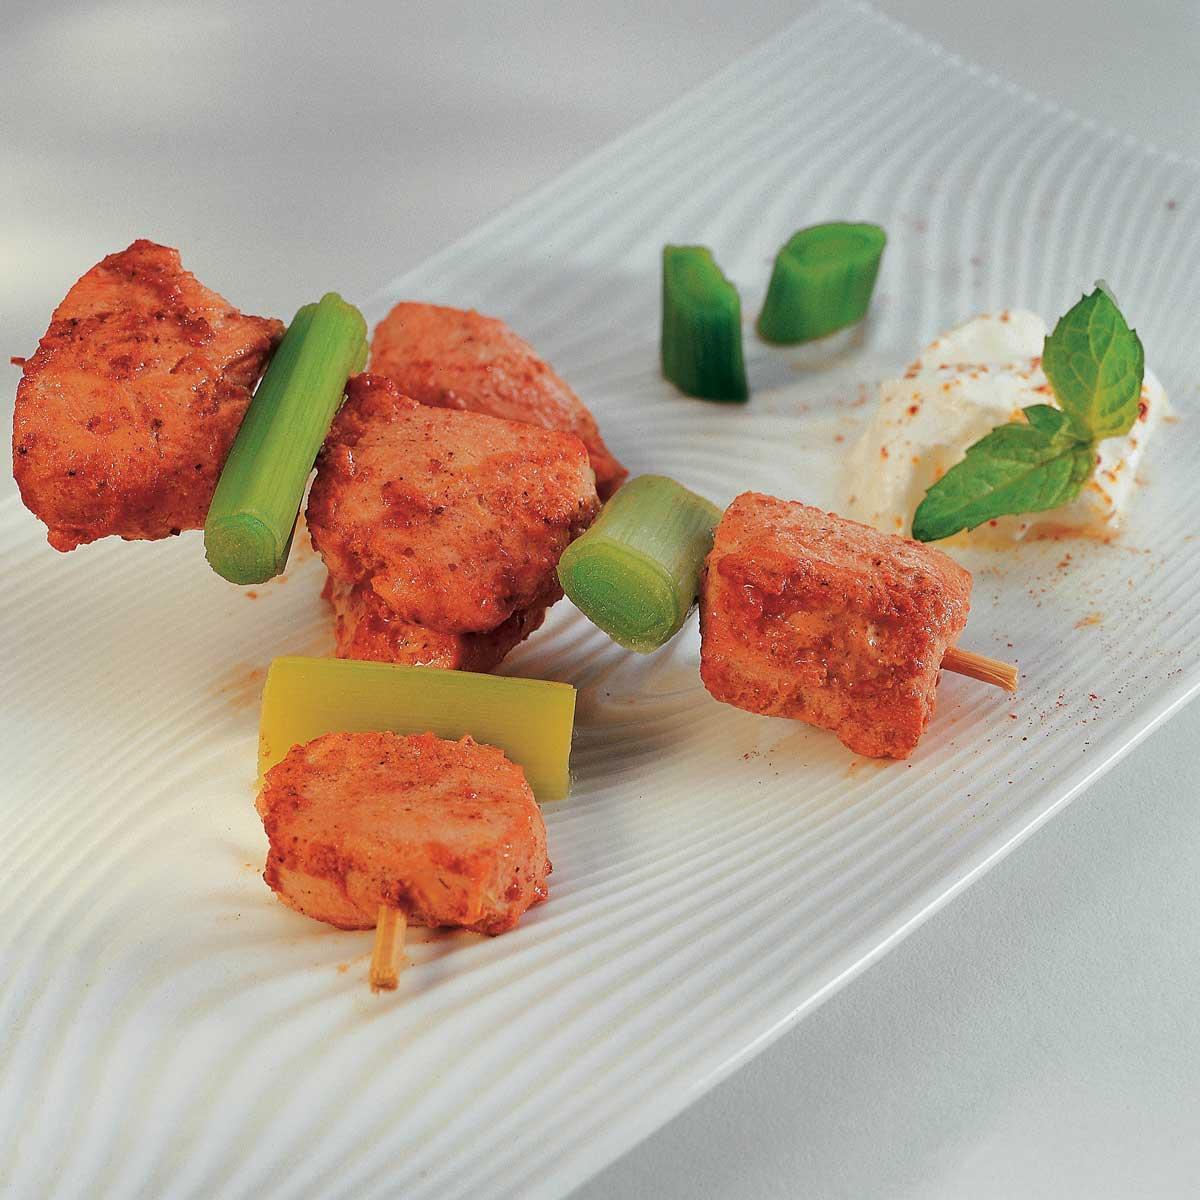 recette brochettes de poulet tandoori cuisine madame figaro. Black Bedroom Furniture Sets. Home Design Ideas